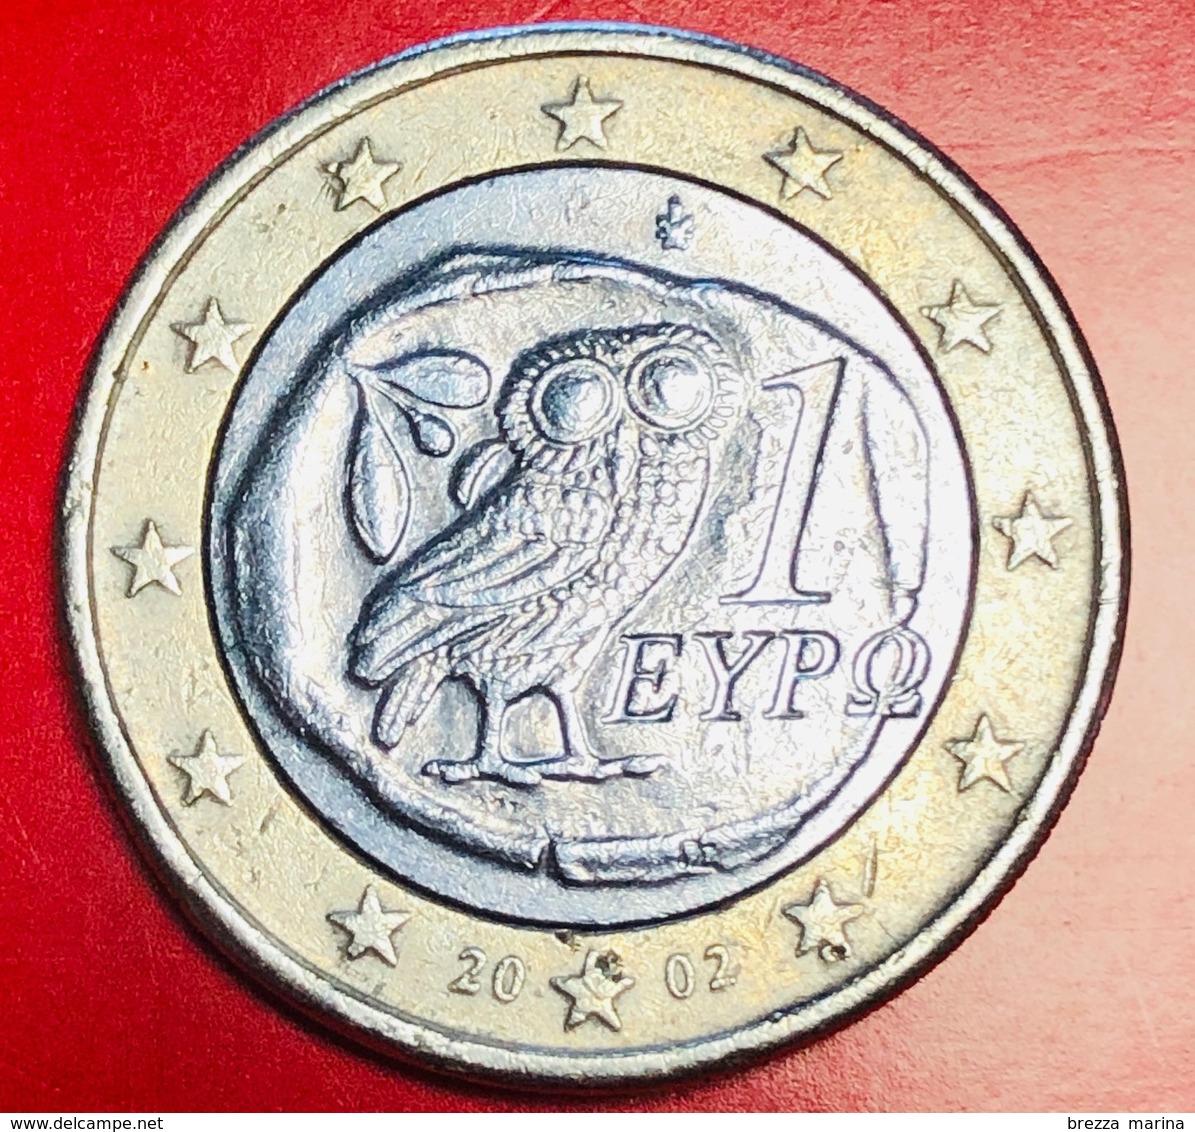 GRECIA - 2002 - Moneta - Civetta - Euro - 1.00 - Grèce